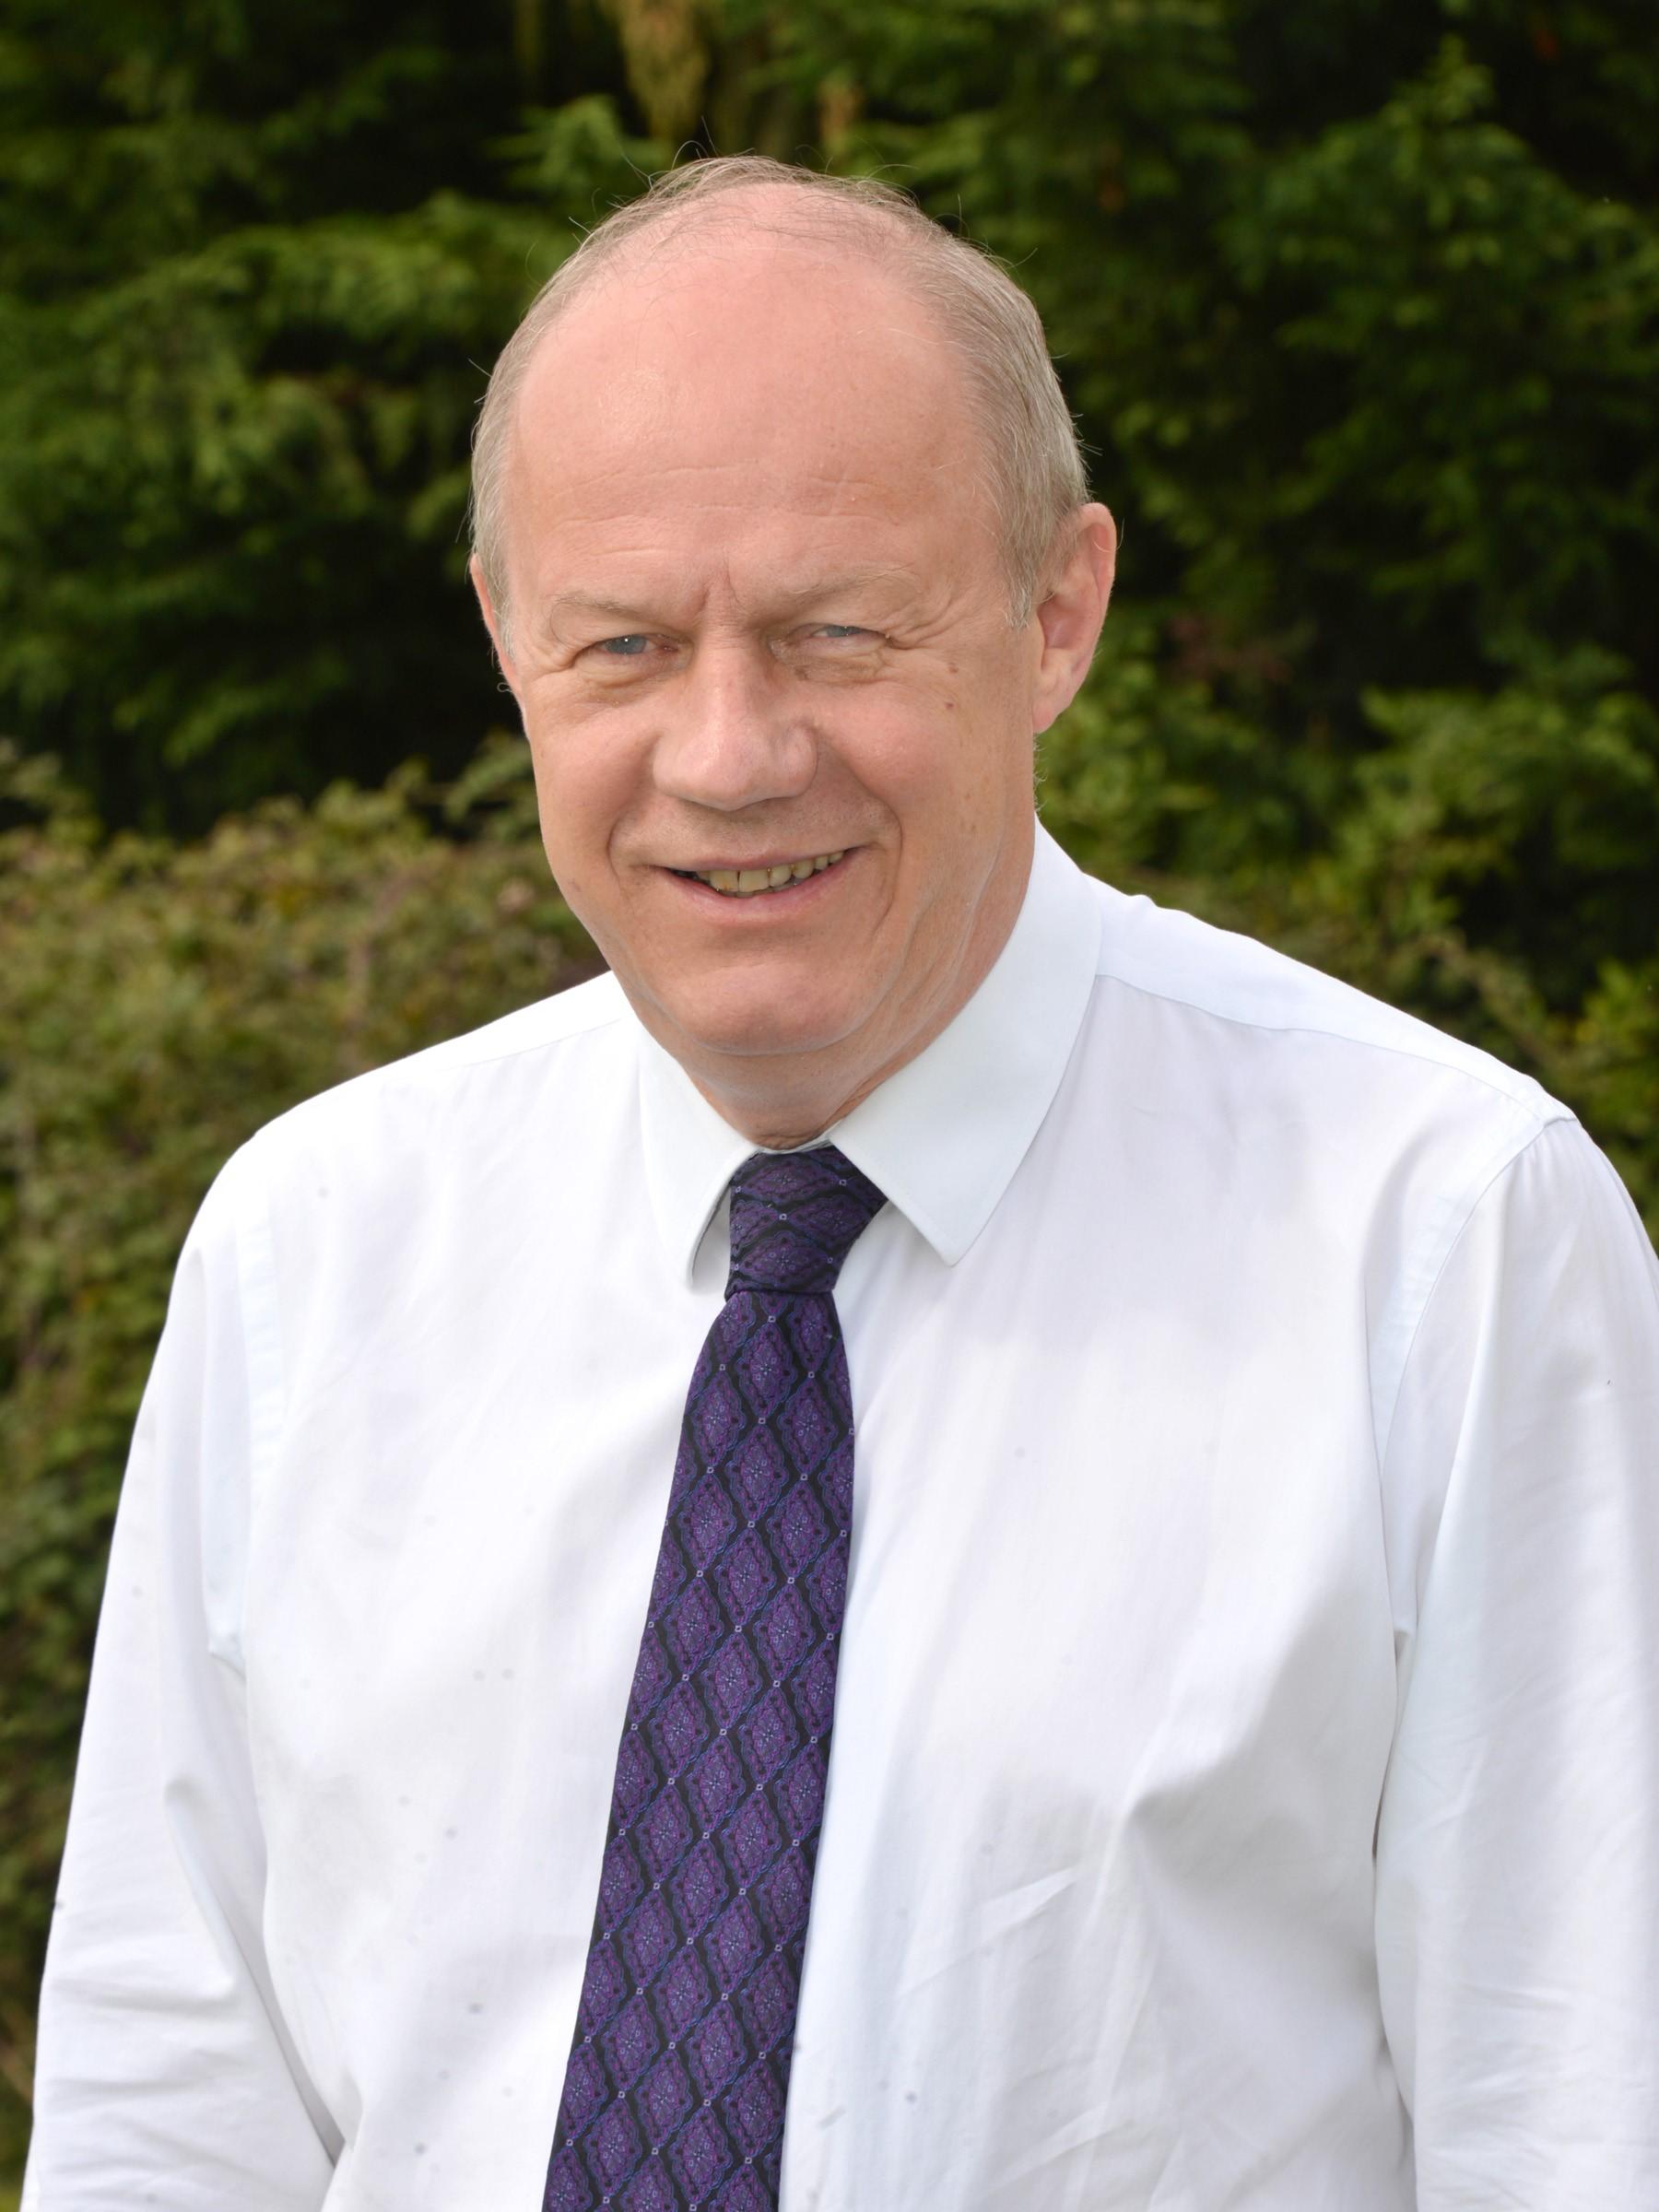 Rt Hon Damian Green MP